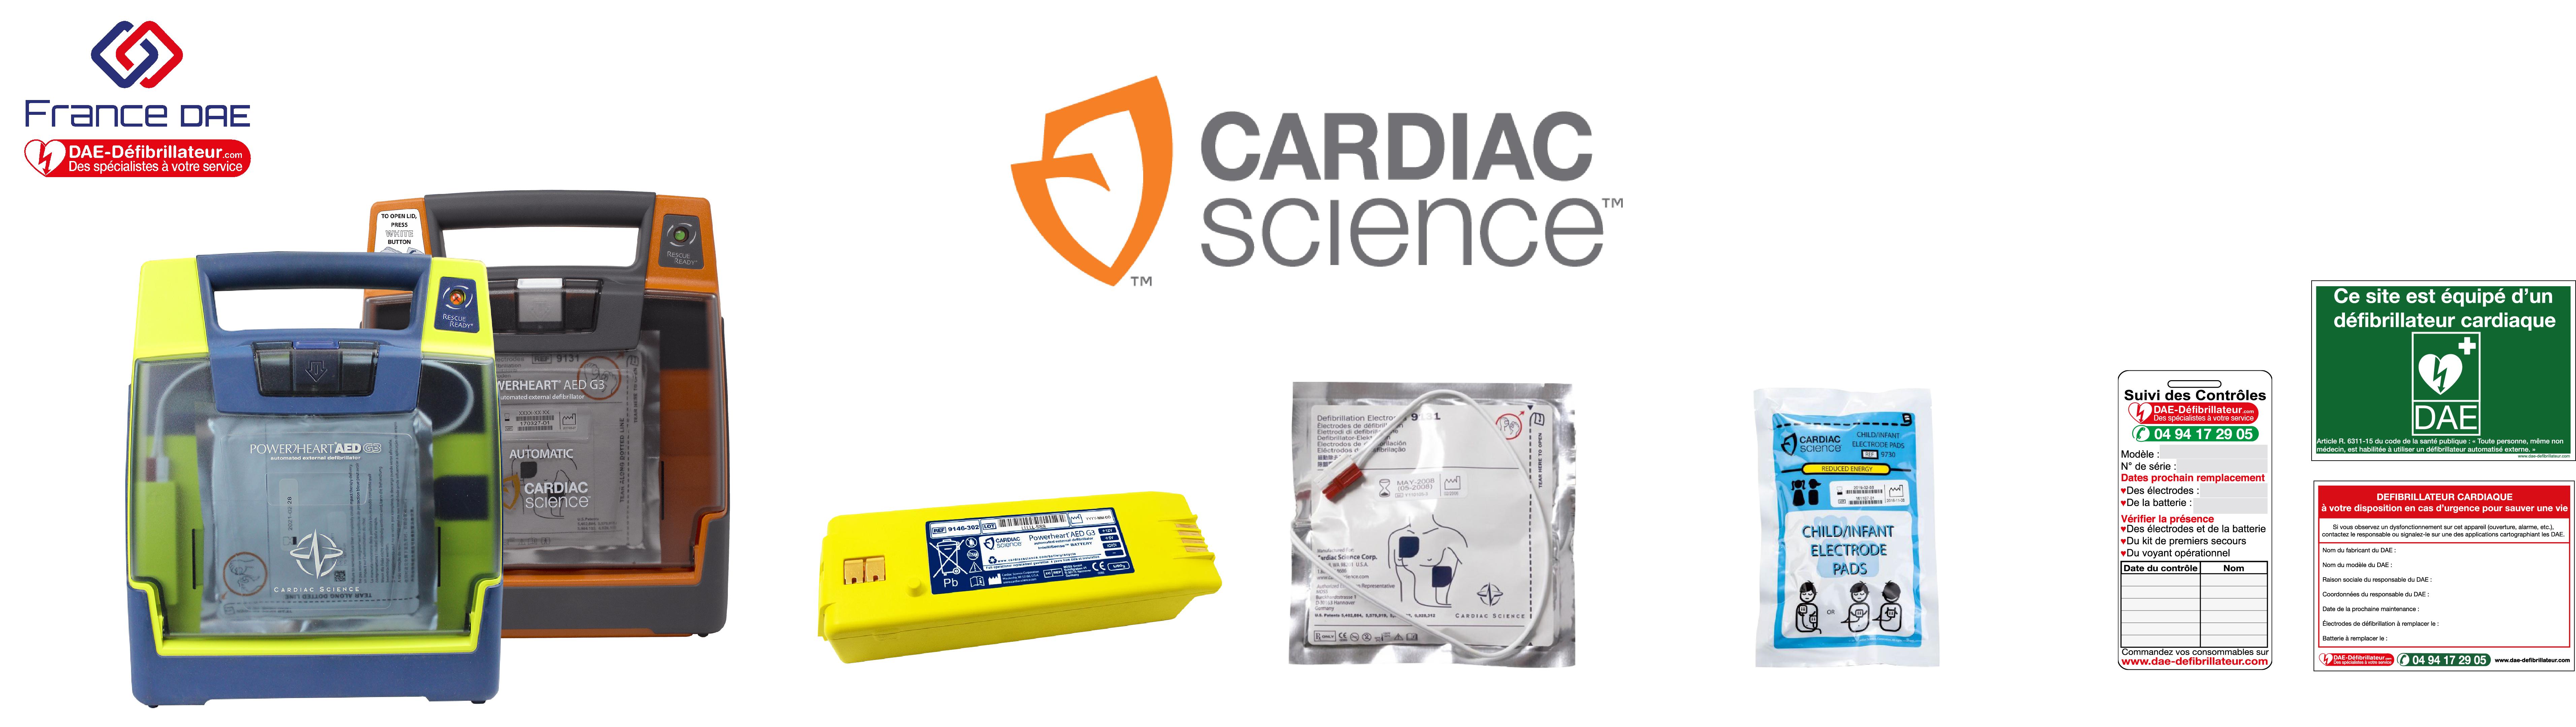 Cardiac science g3.jpg